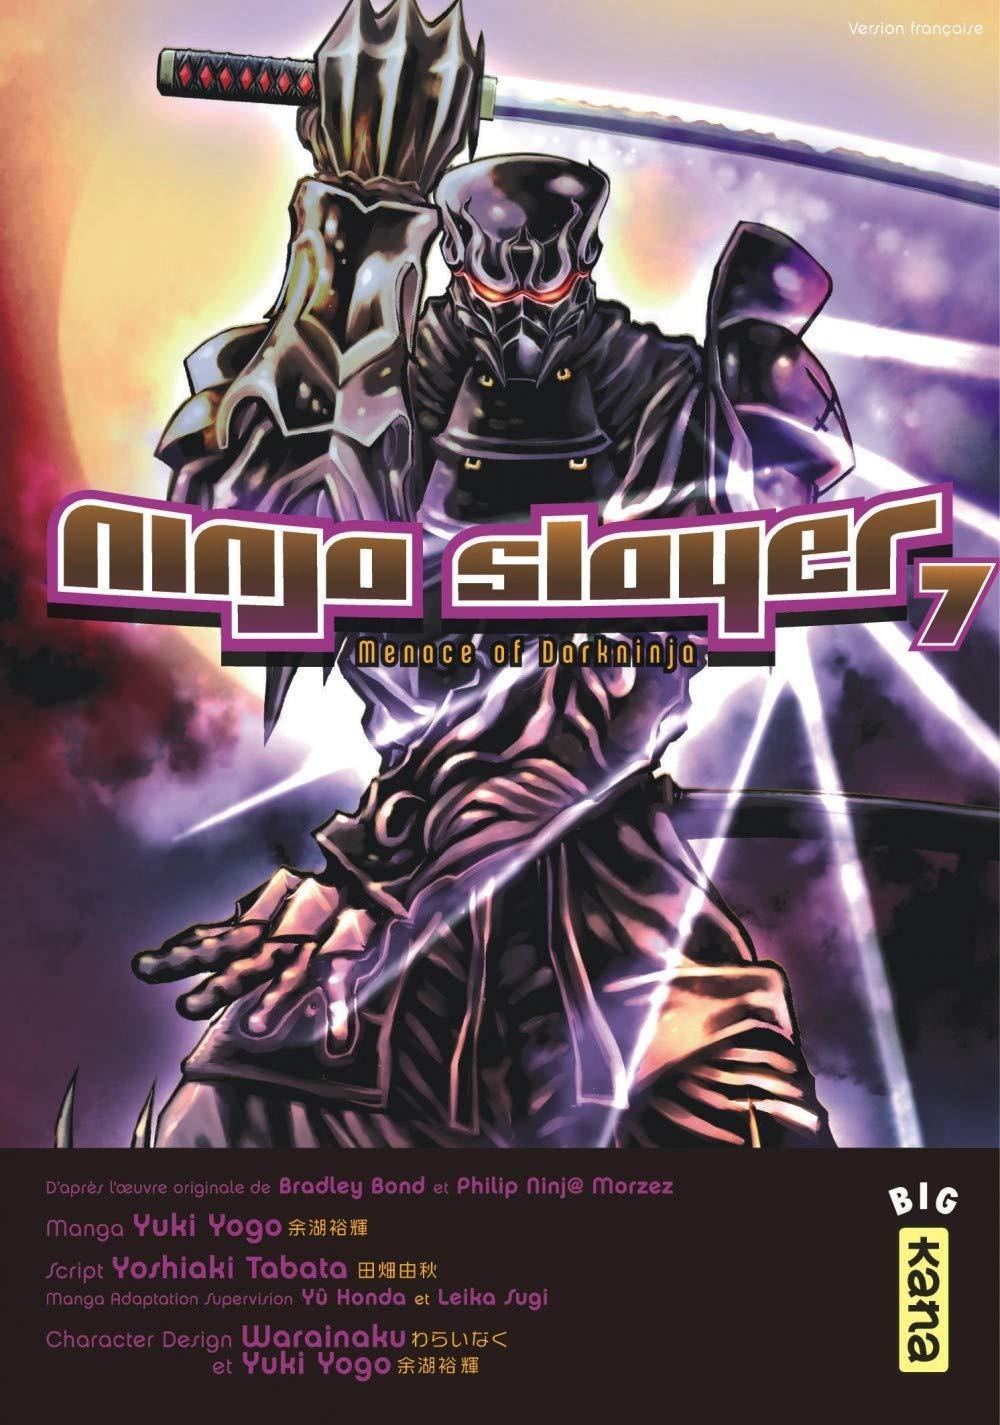 Ninja slayer, tome 7: Amazon.es: Yoshiaki Tabata, Yuki Yogo ...